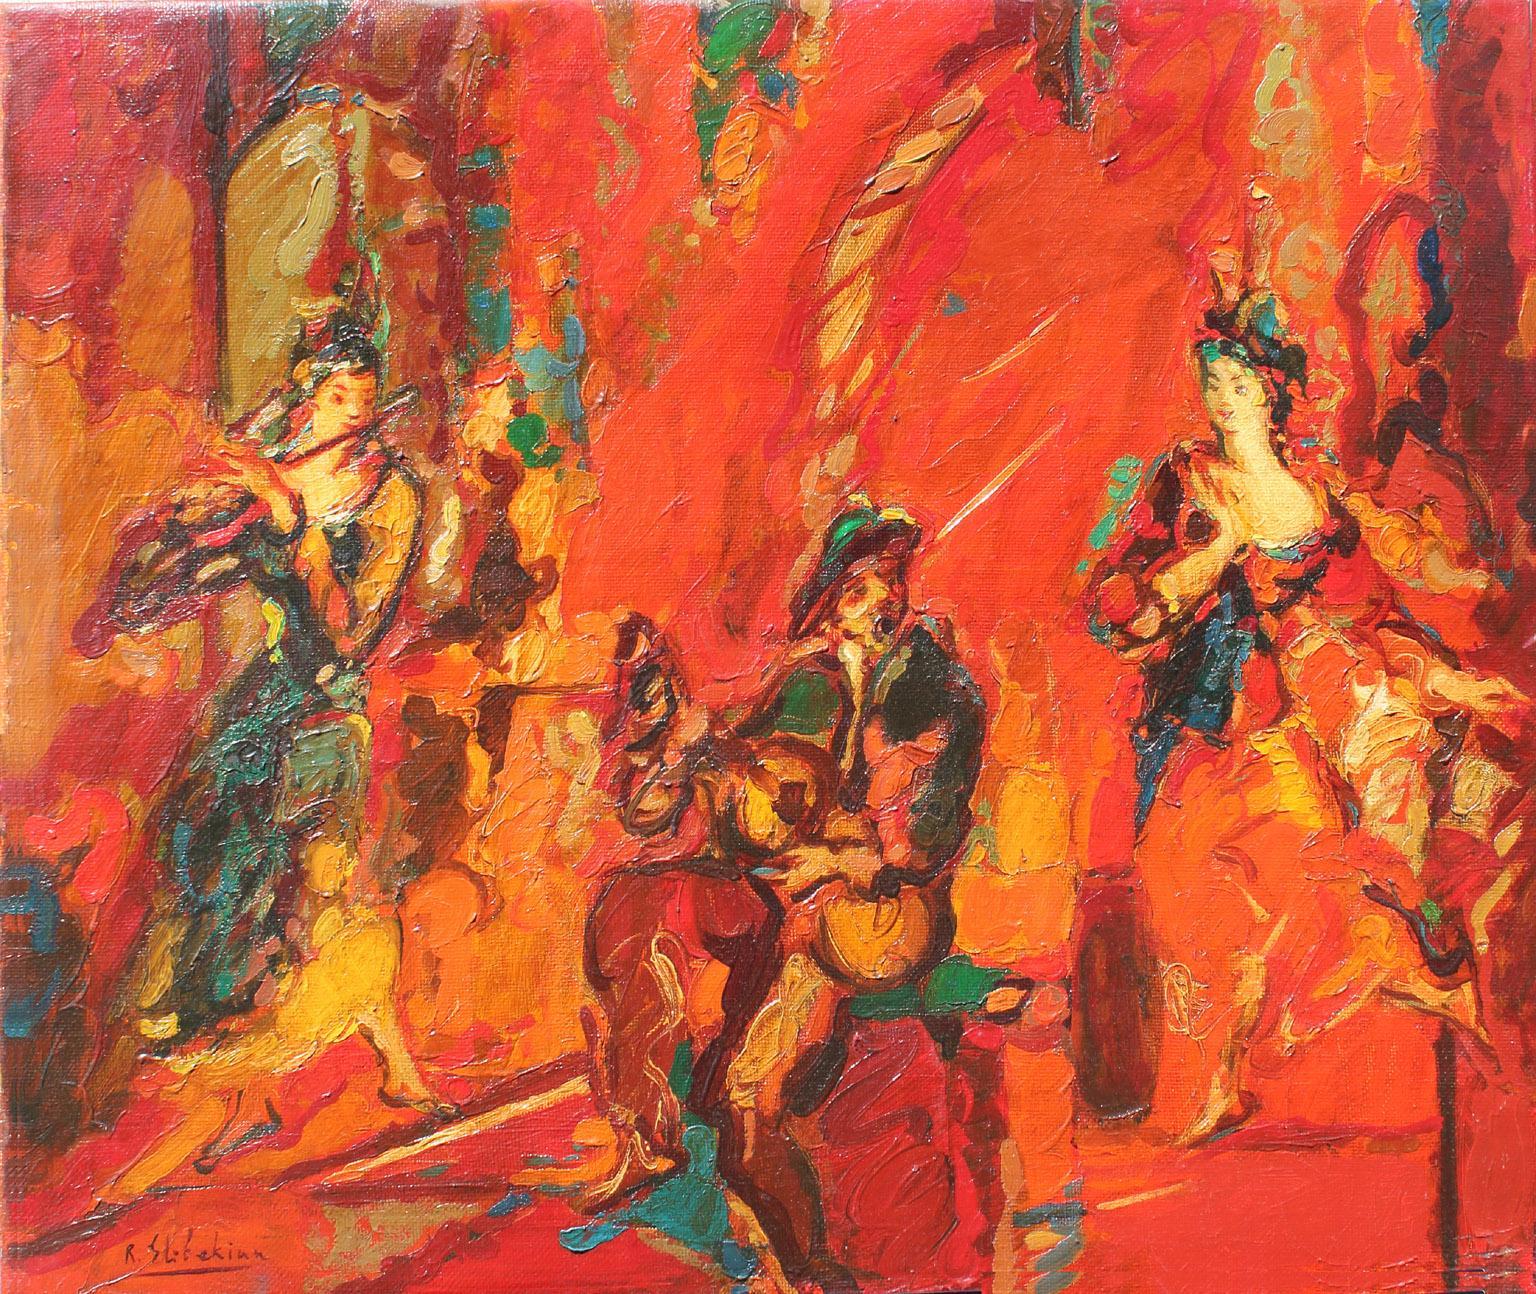 Robert Elibekian, Concerts, 25.5x19.5 in. Original oil on canvas